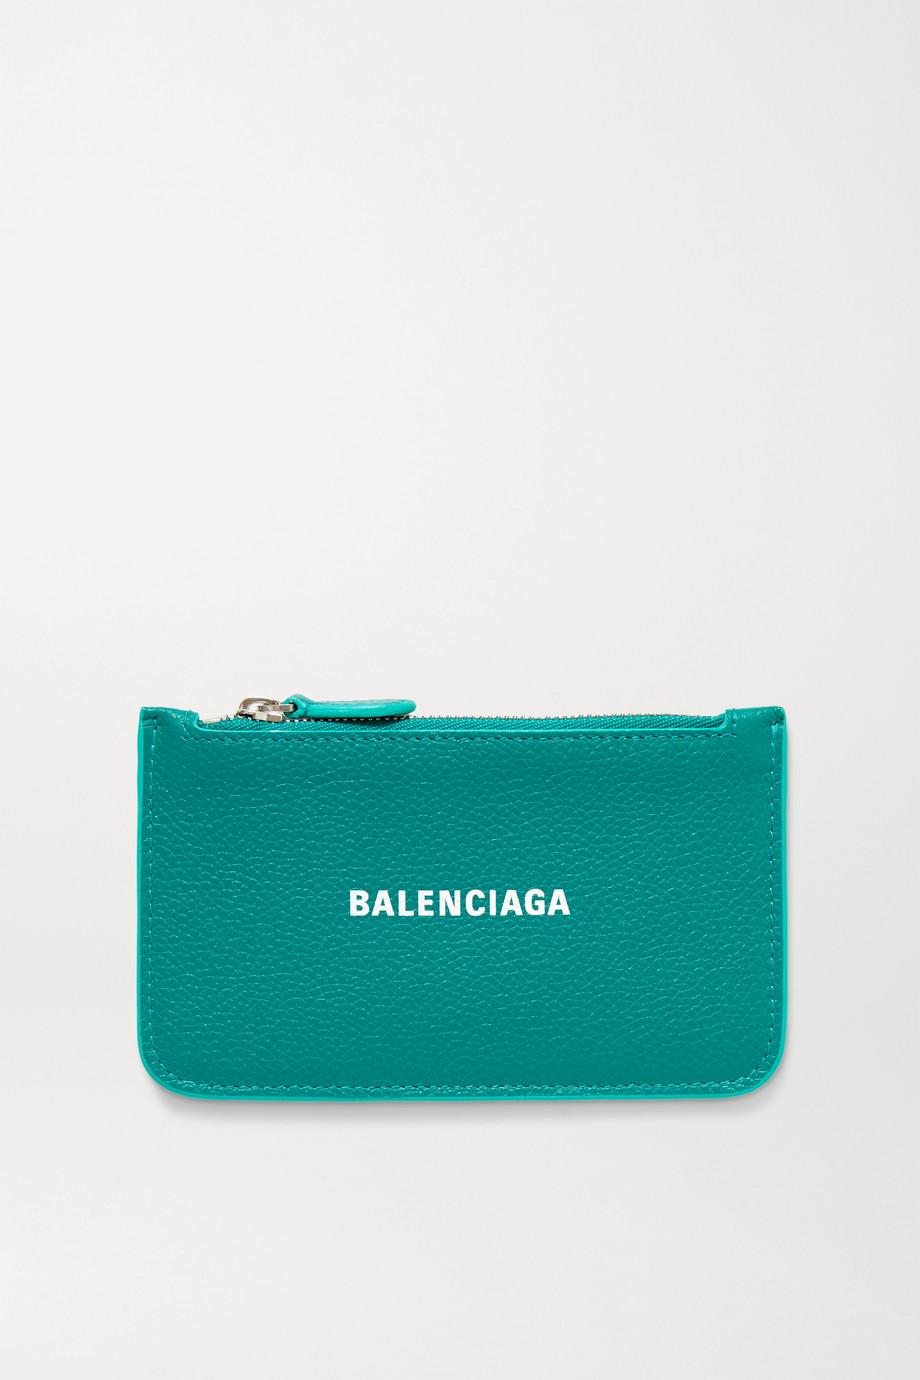 Balenciaga Cash Portemonnaie aus strukturiertem Leder mit Print